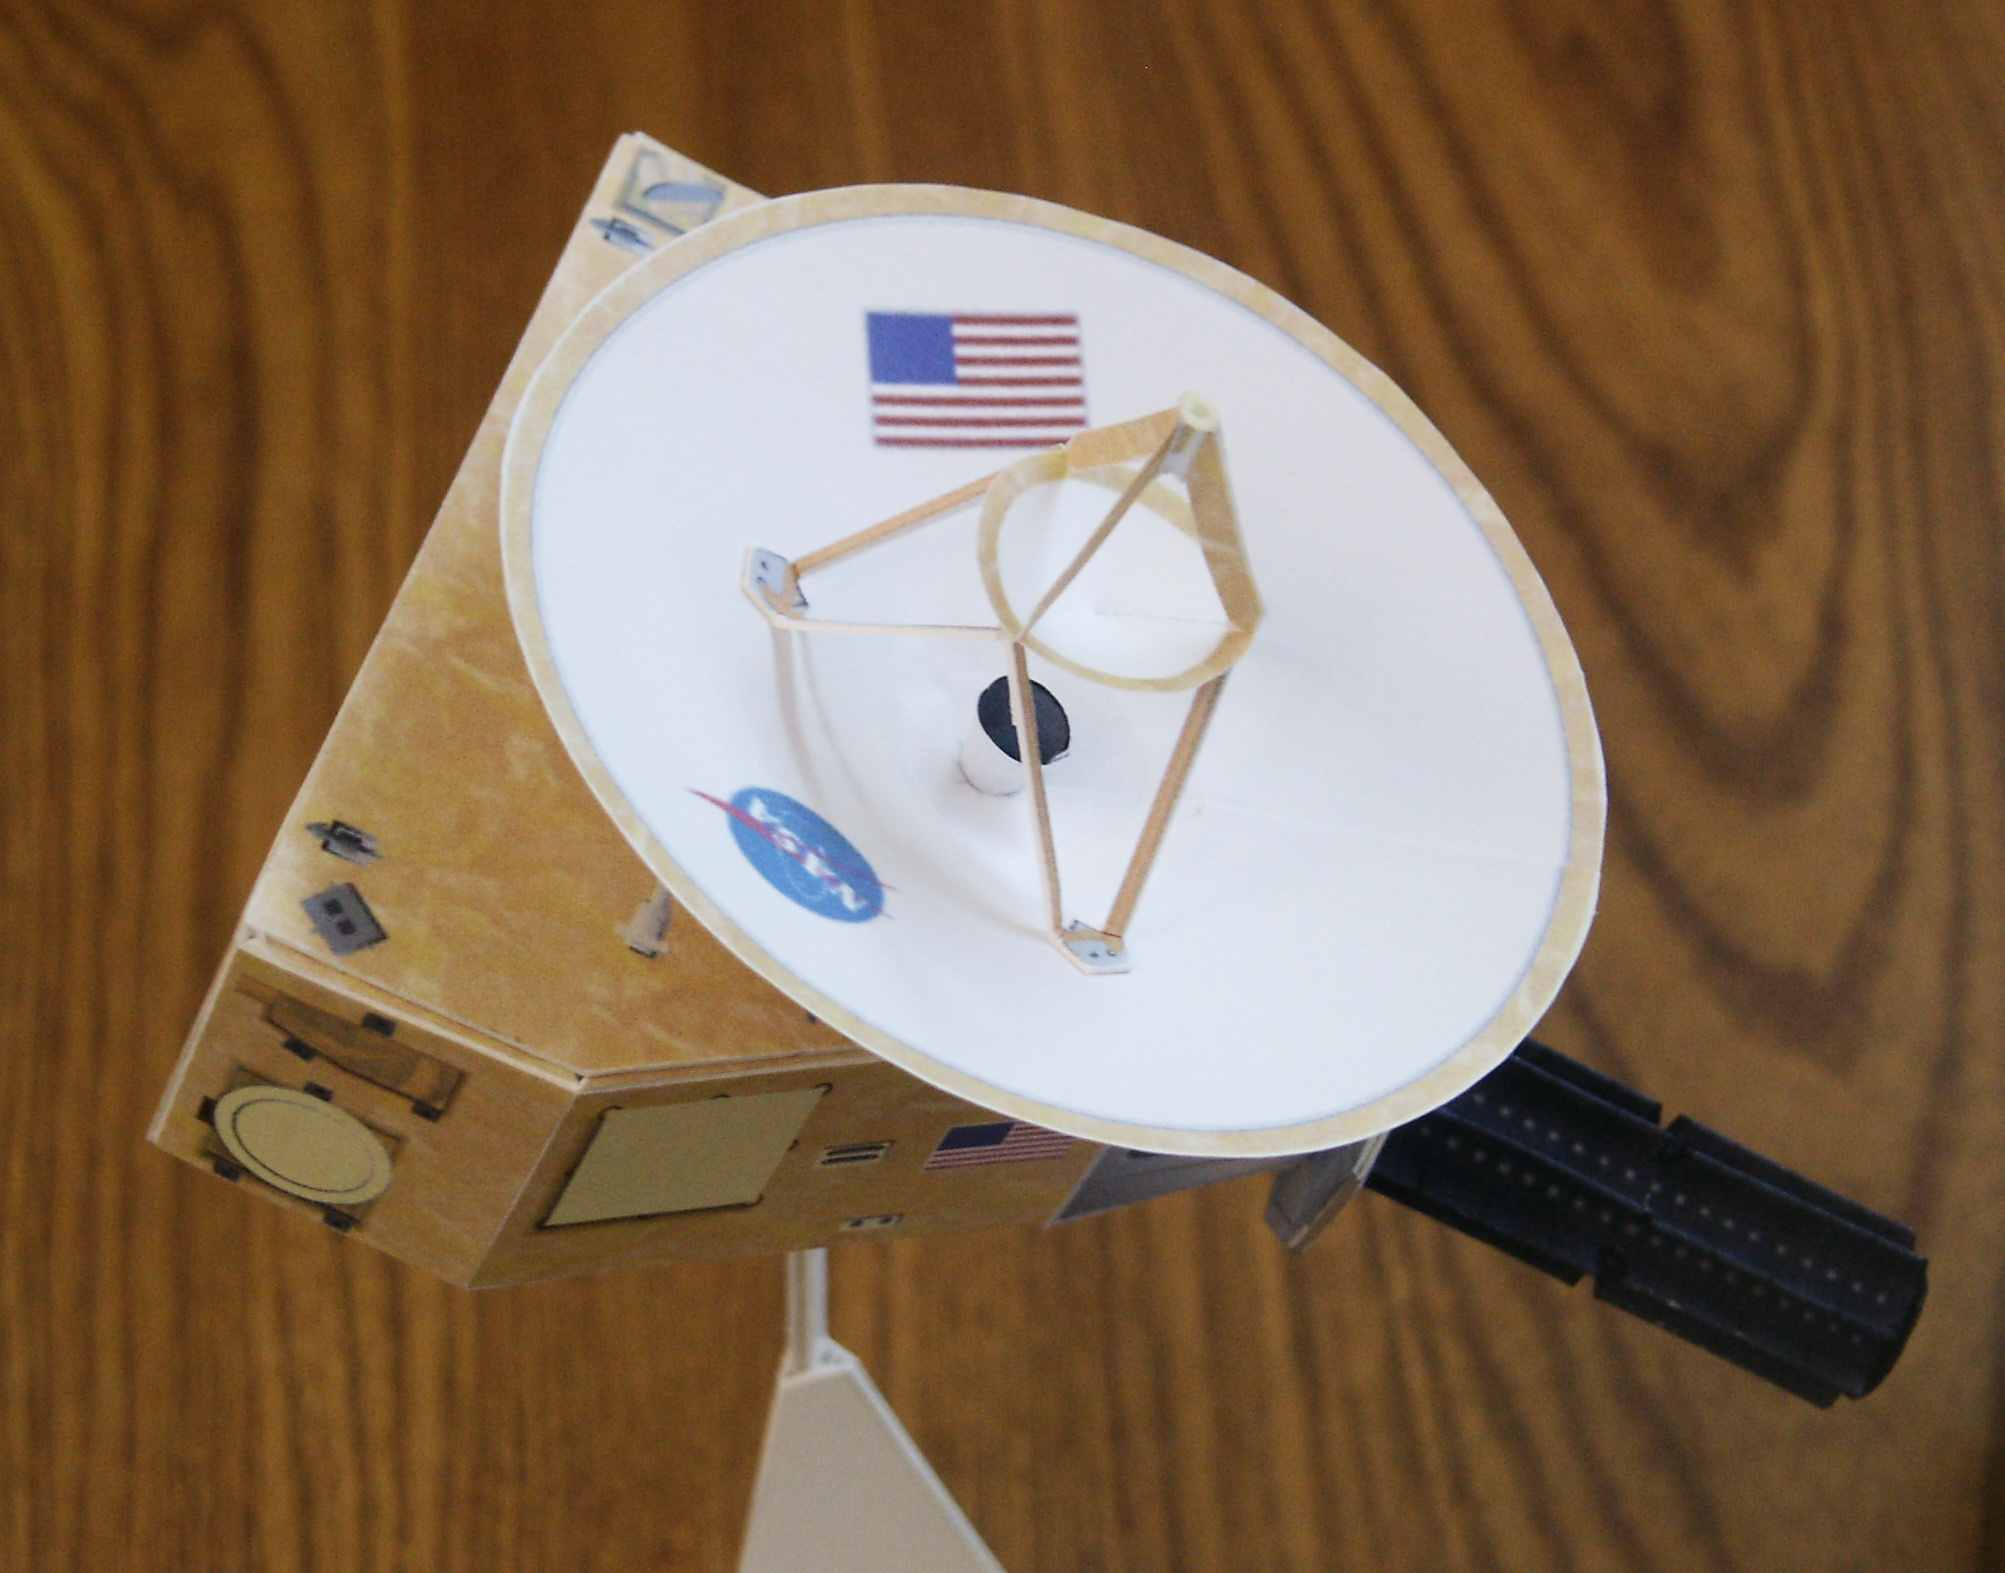 paper spacecraft models - photo #38